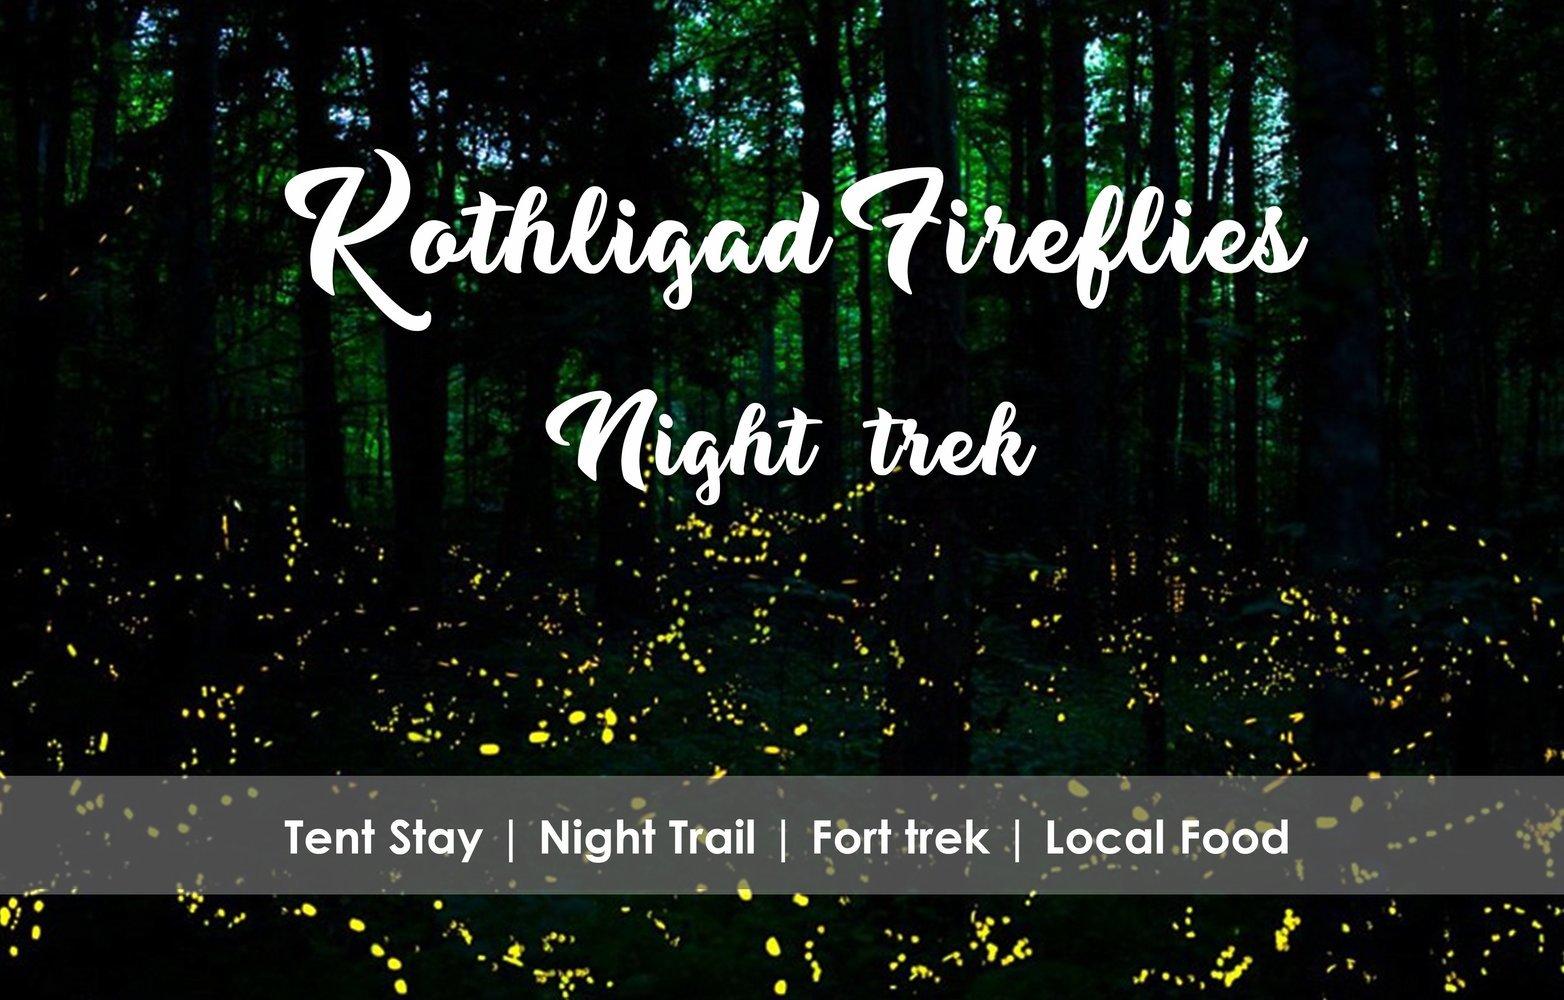 Kothaligad Night Trek and Fireflies